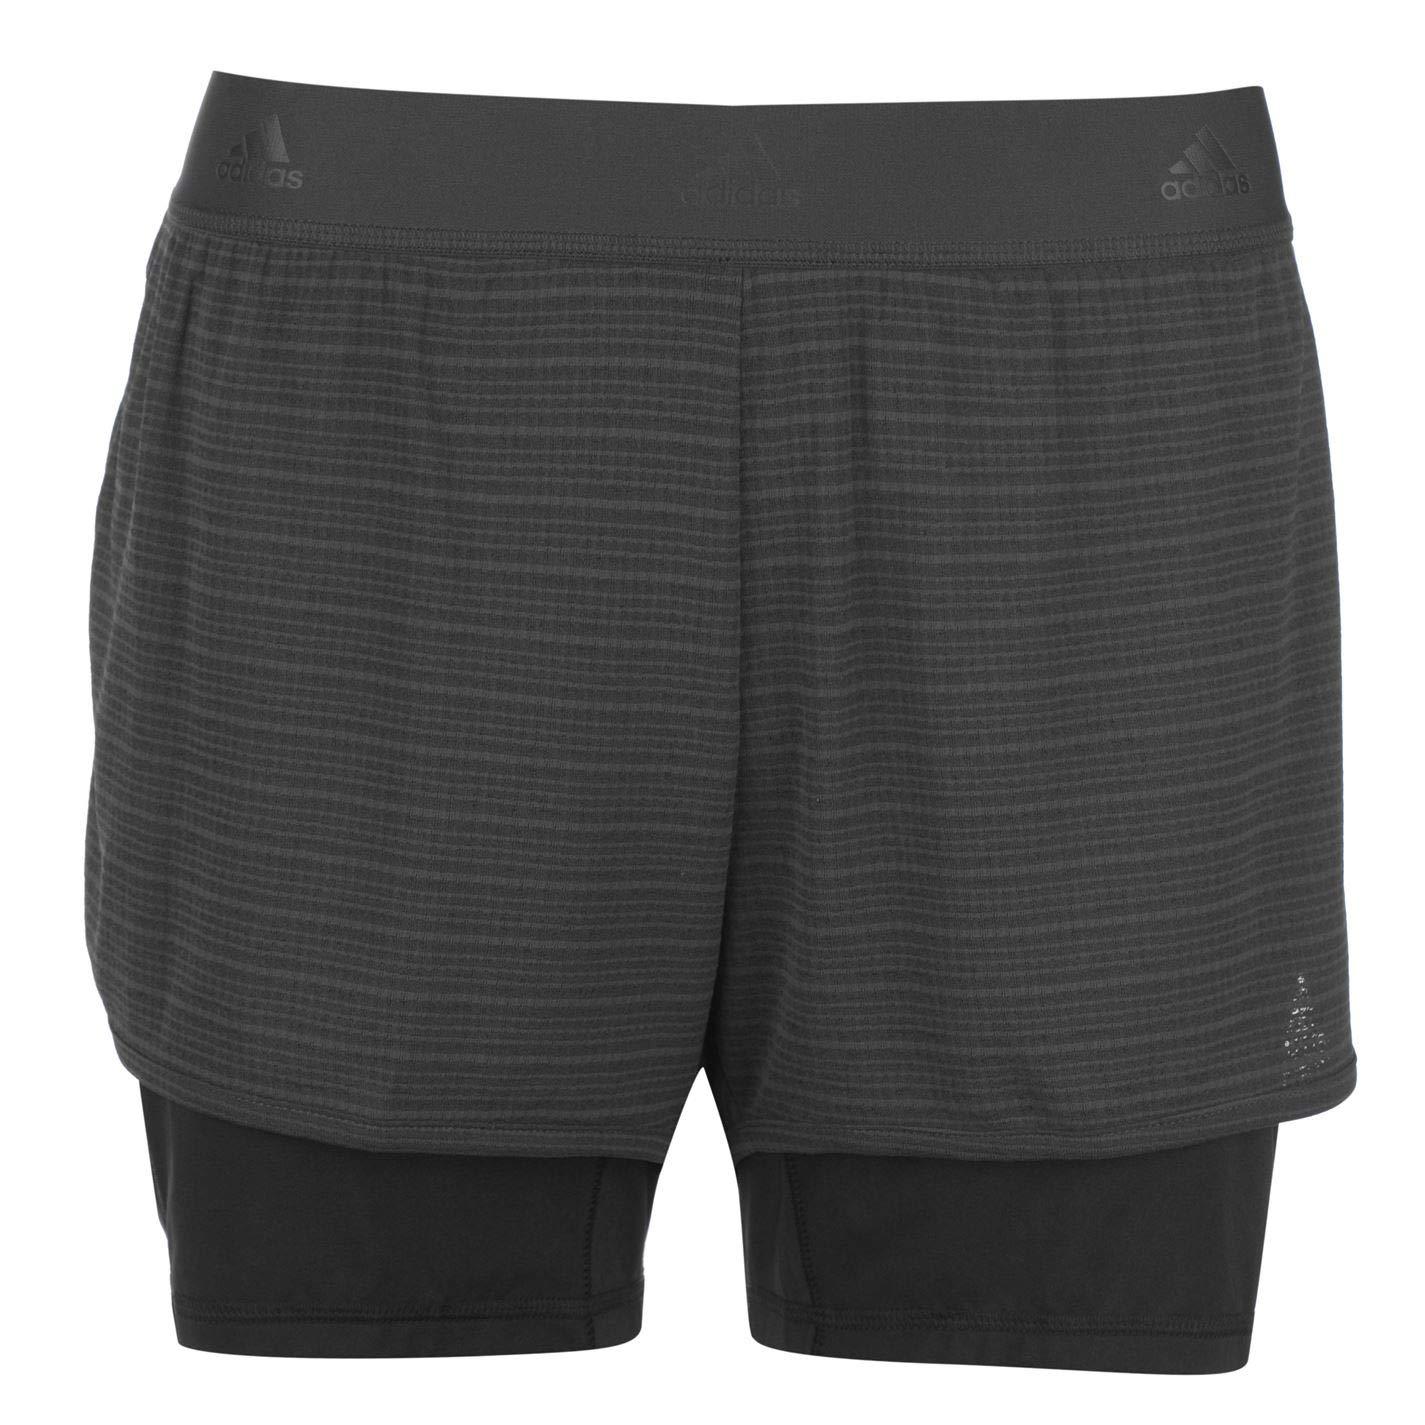 Adidas 2in1Chill Shrt–Pantaloncini, Donna, Grigio (Carbon) CW4054